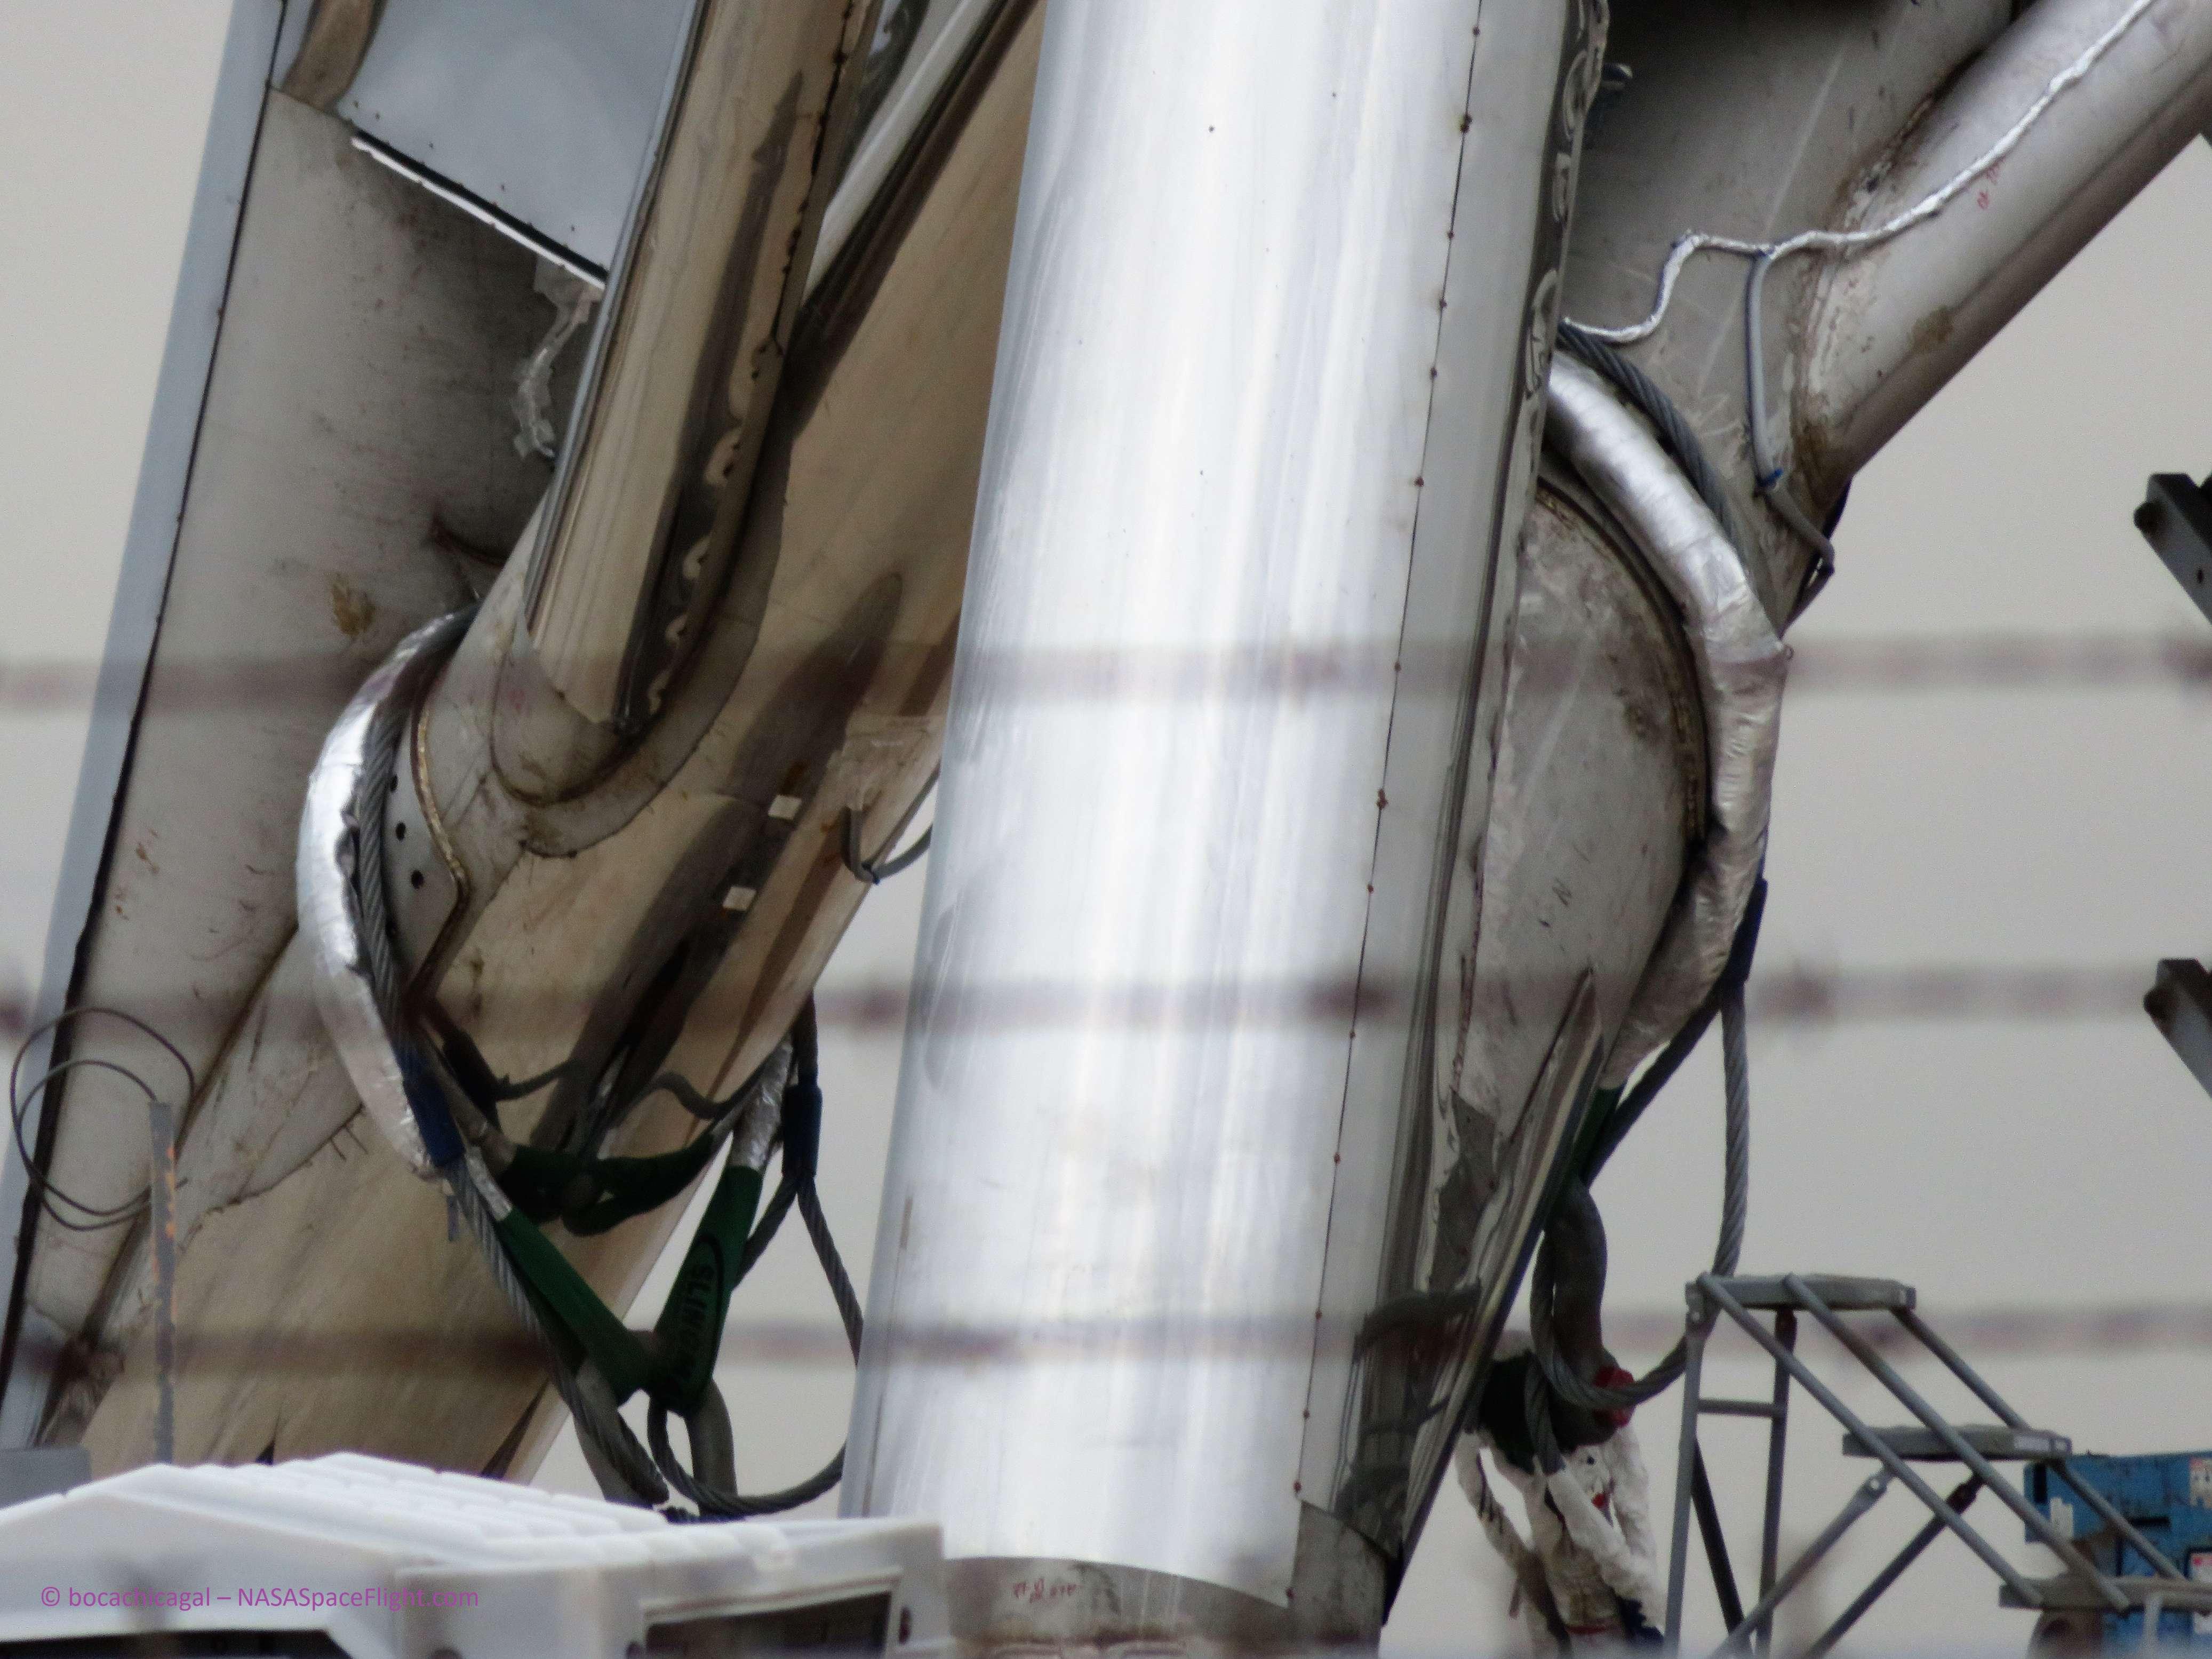 Boca Chica Starhopper progress 032619 (NASASpaceflight – bocachicagal) 2 (c)